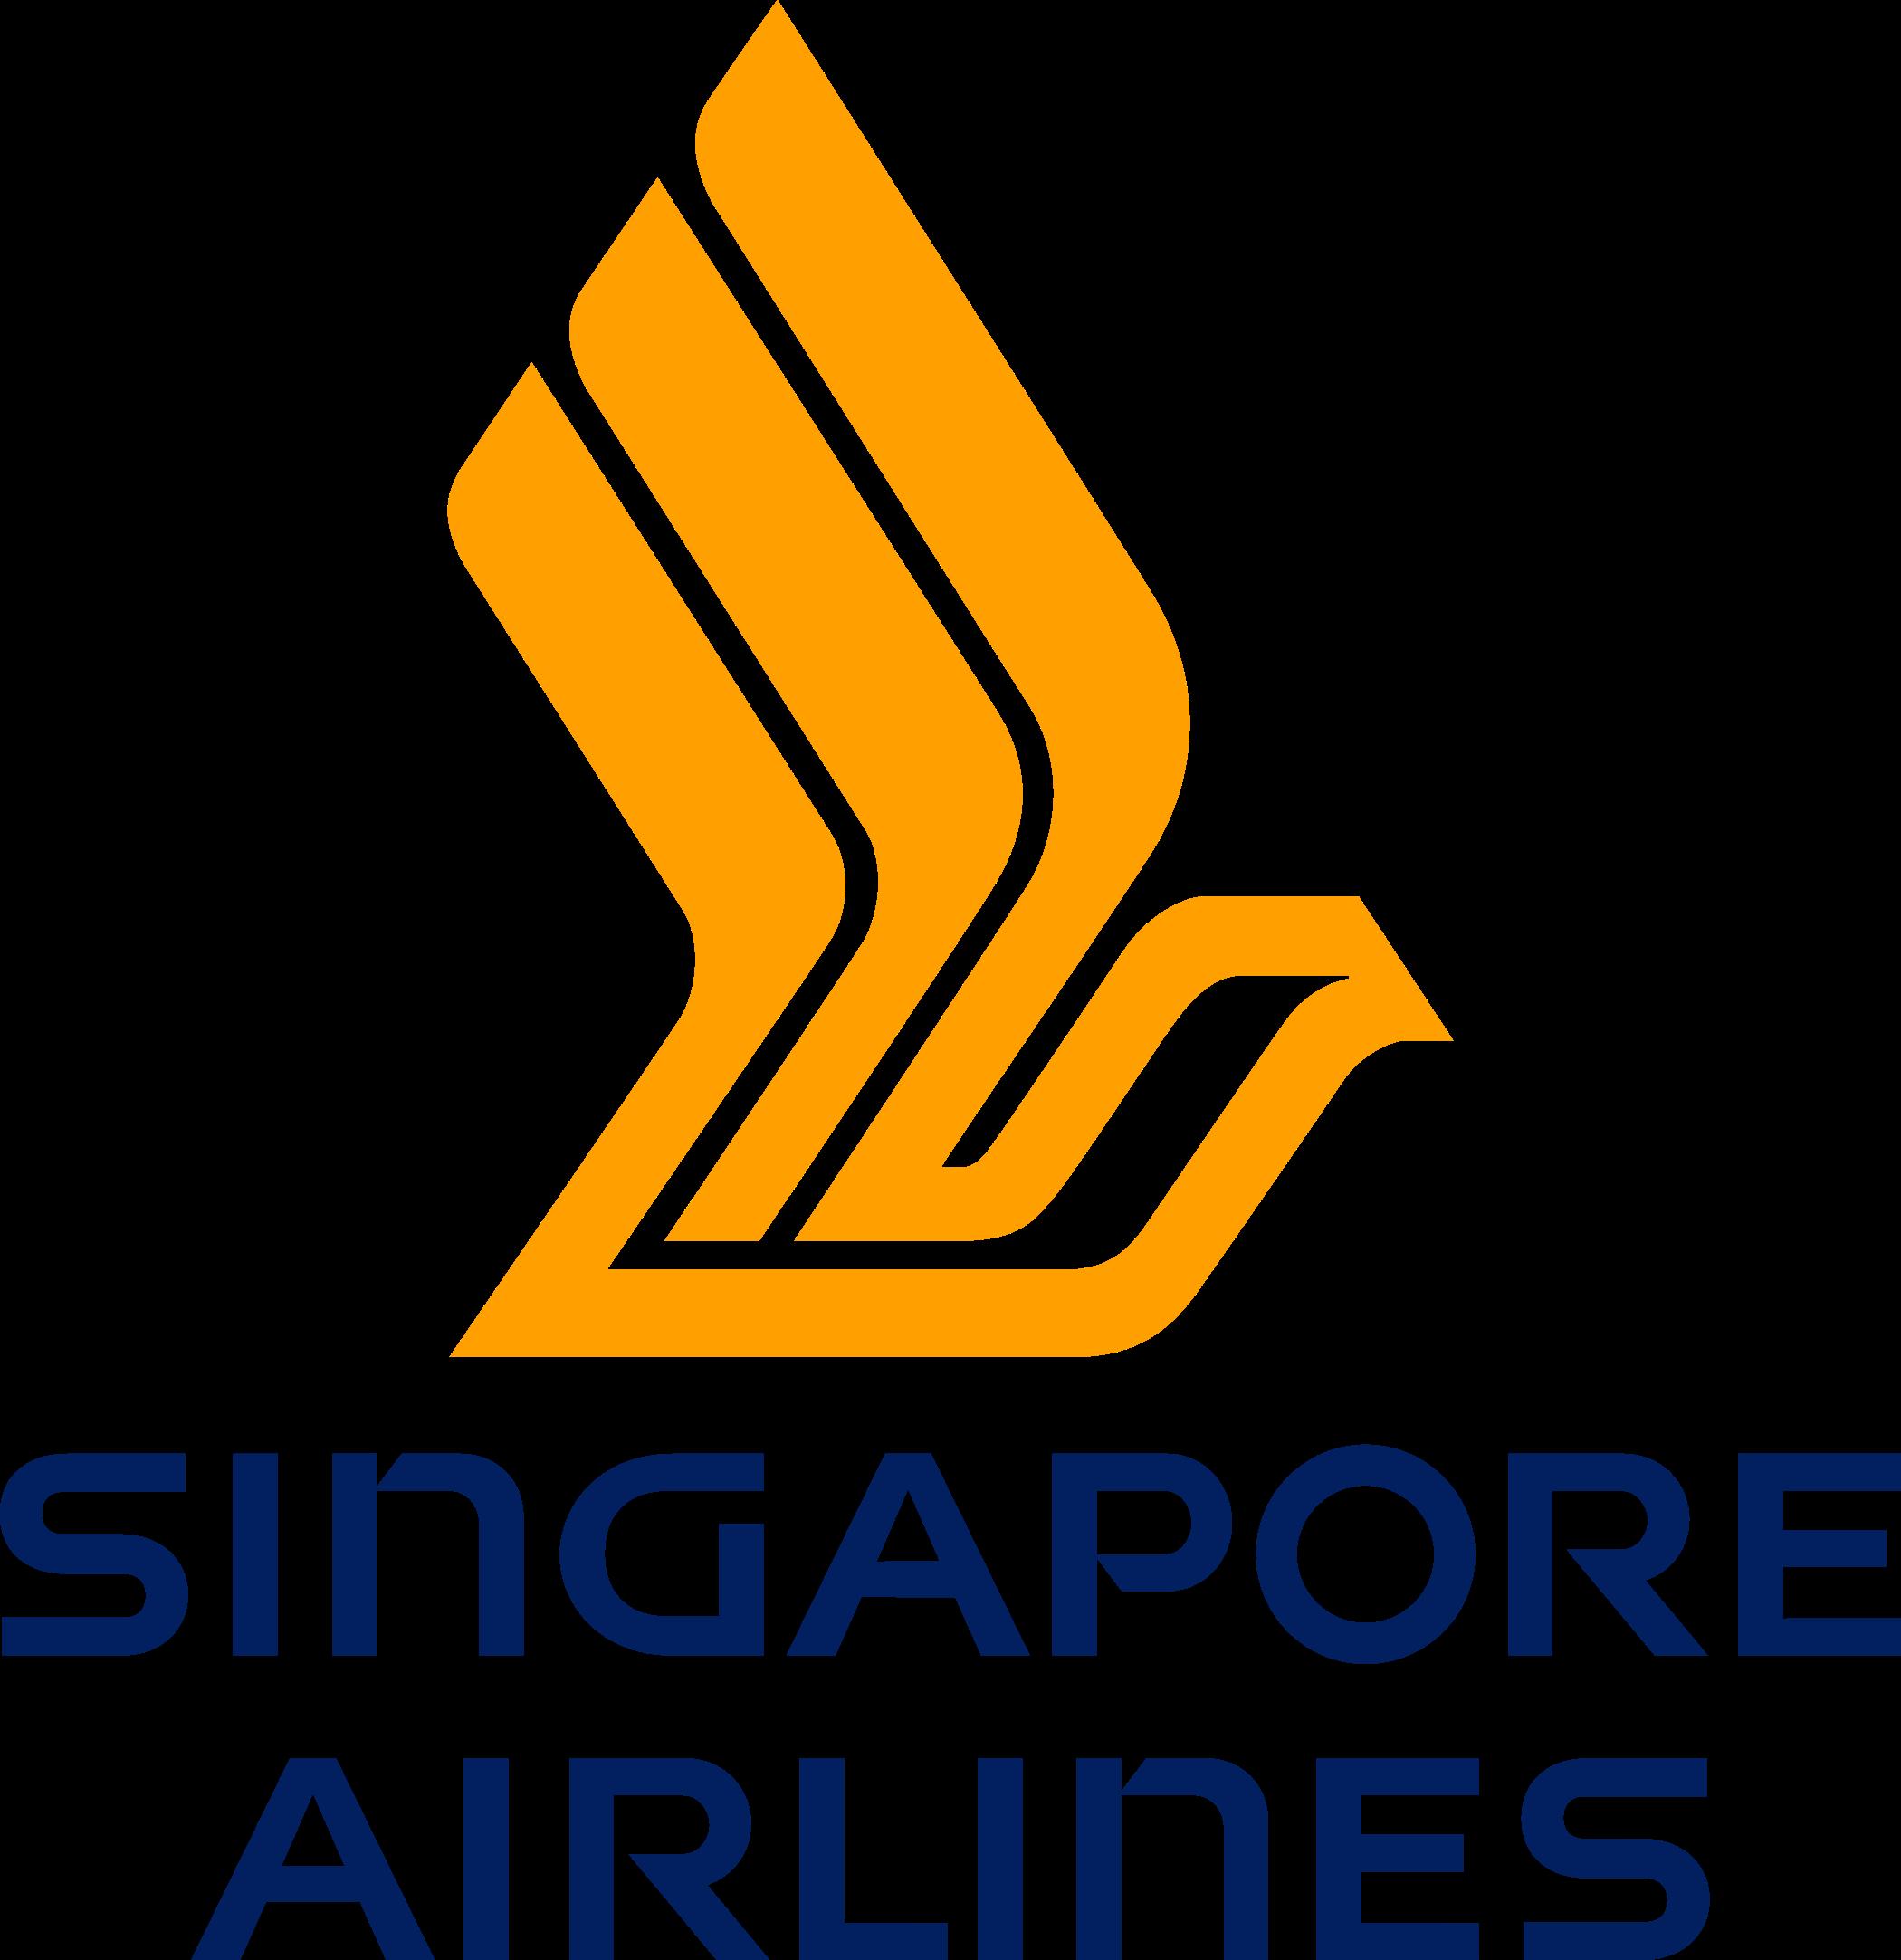 singapore airlines logo 3 - Singapore Airlines Logo